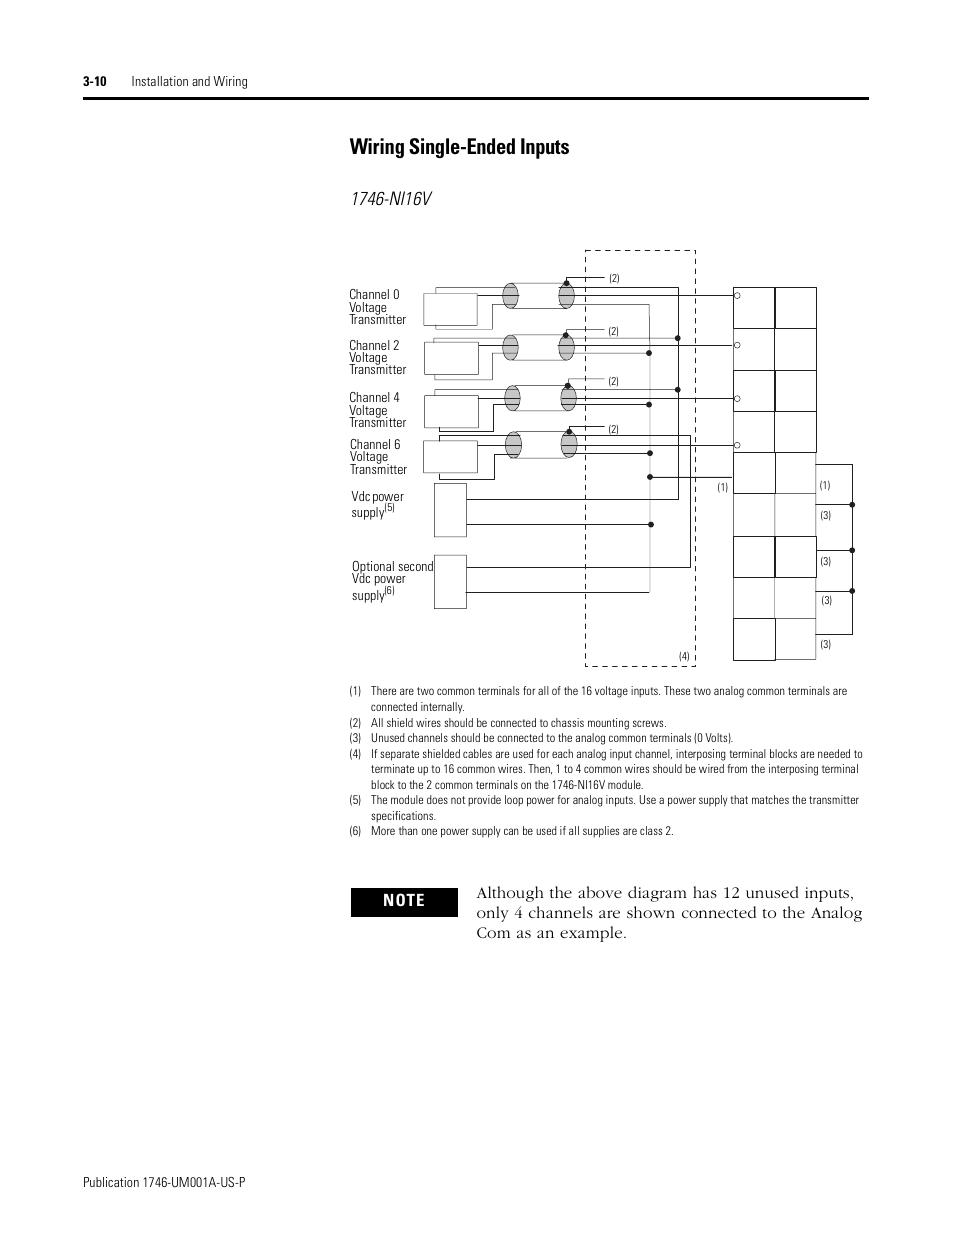 medium resolution of wiring single ended inputs 10 wiring single ended inputs rockwell automation 1746 ni16v slc 500 analog input modules user manual user manual page 32